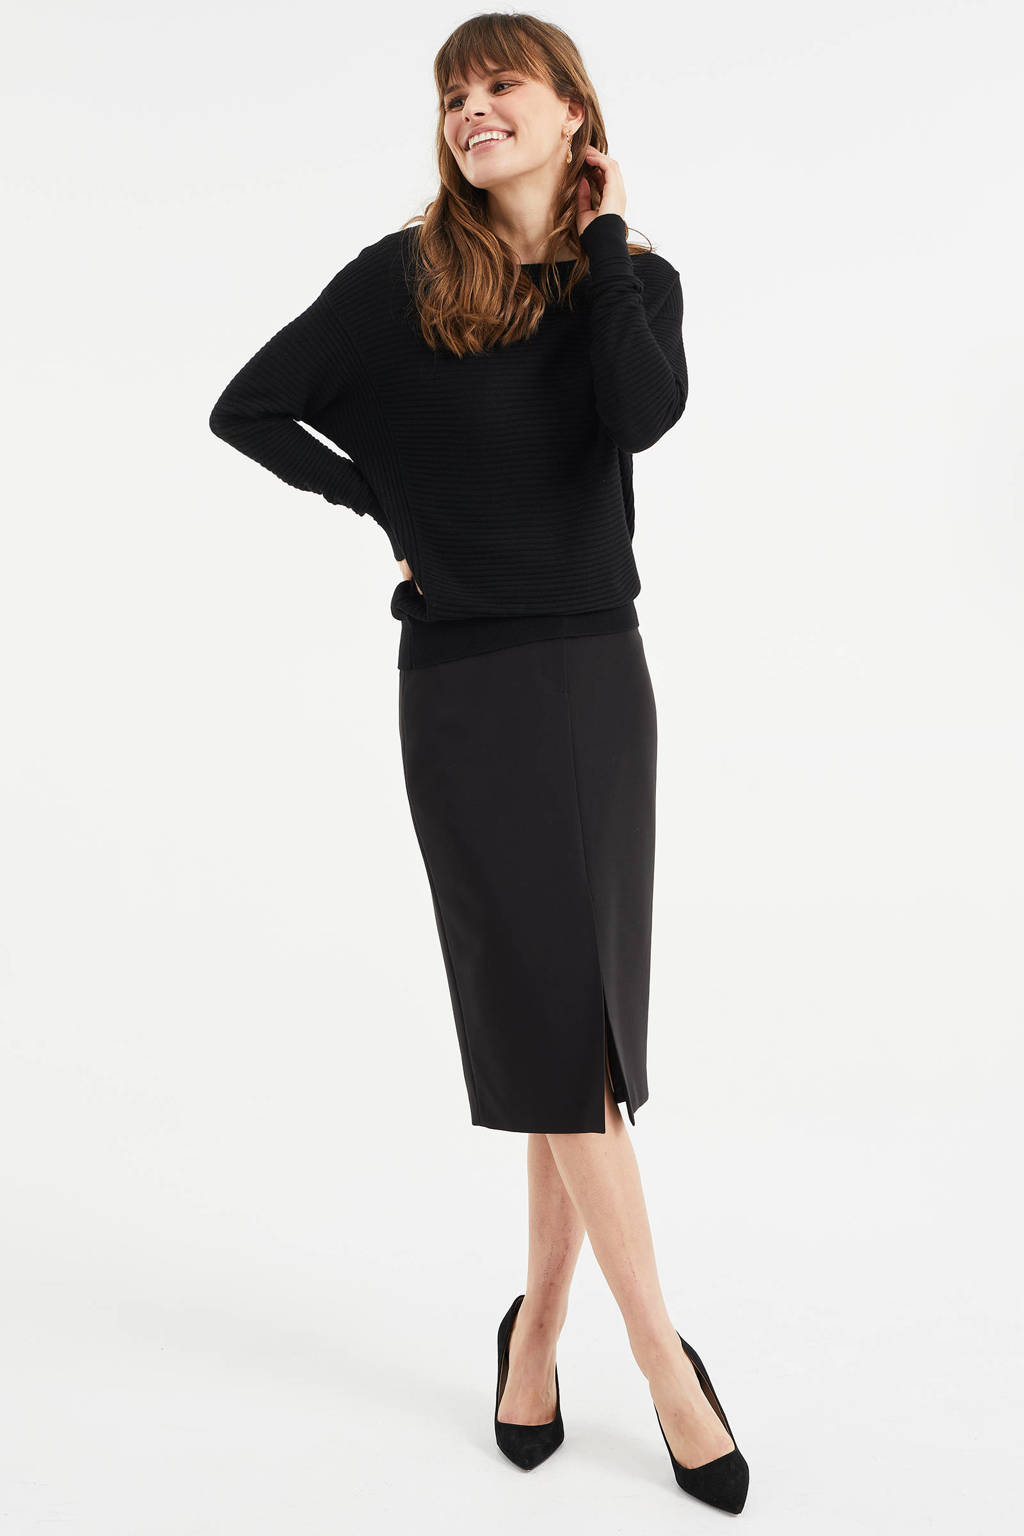 WE Fashion fijngebreide trui met textuur black uni, Black Uni